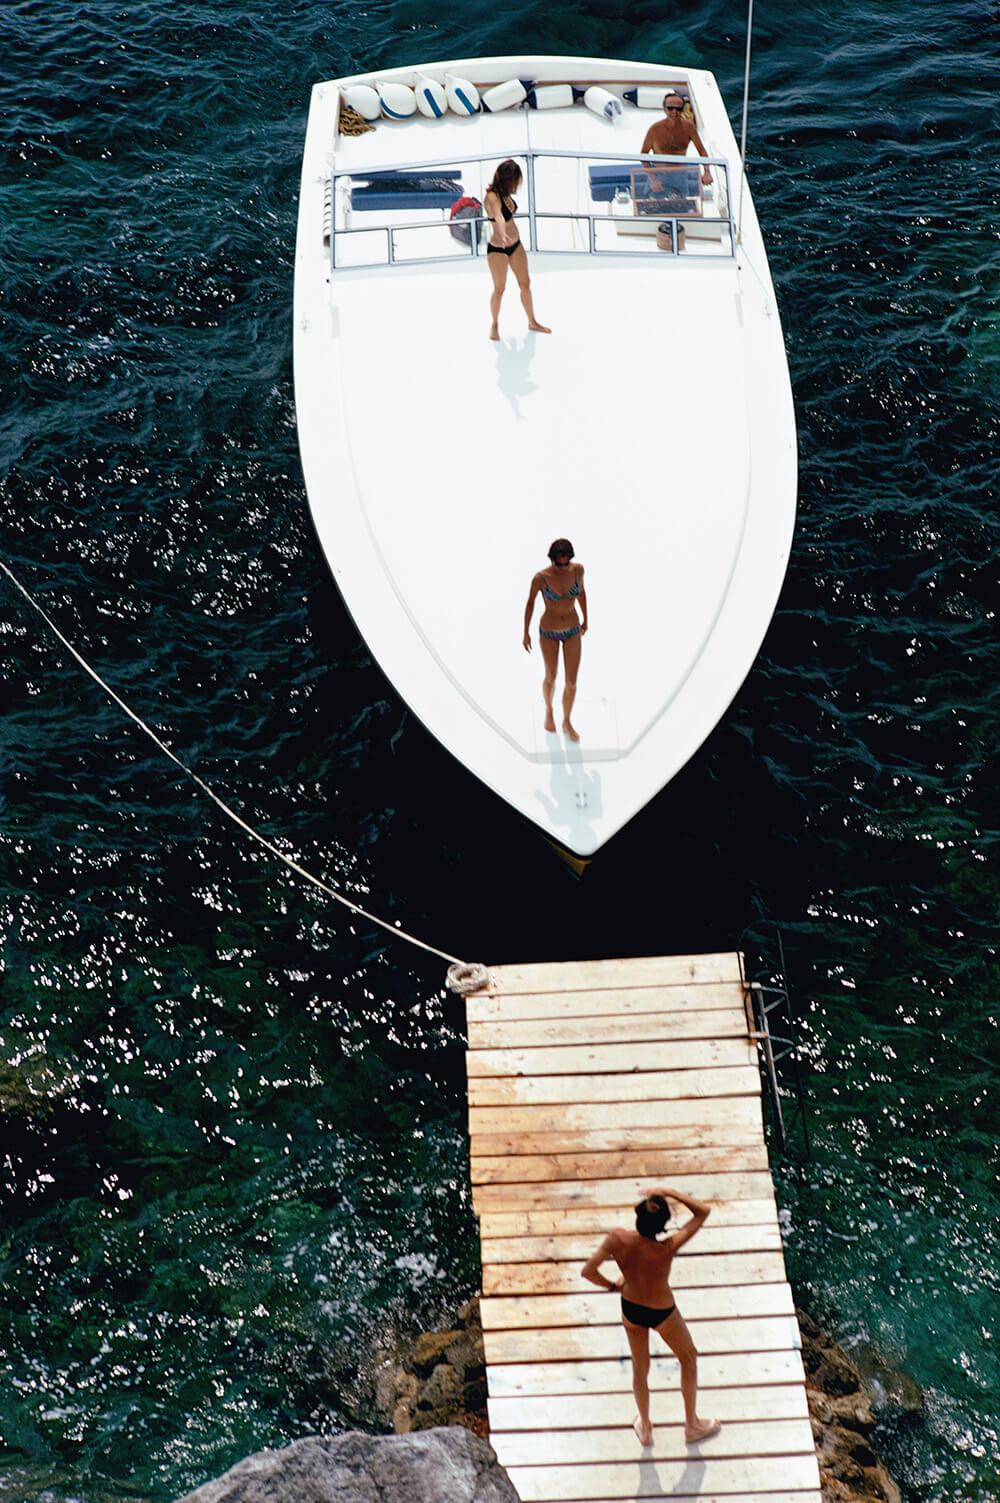 Speedboat Landing fine art photography